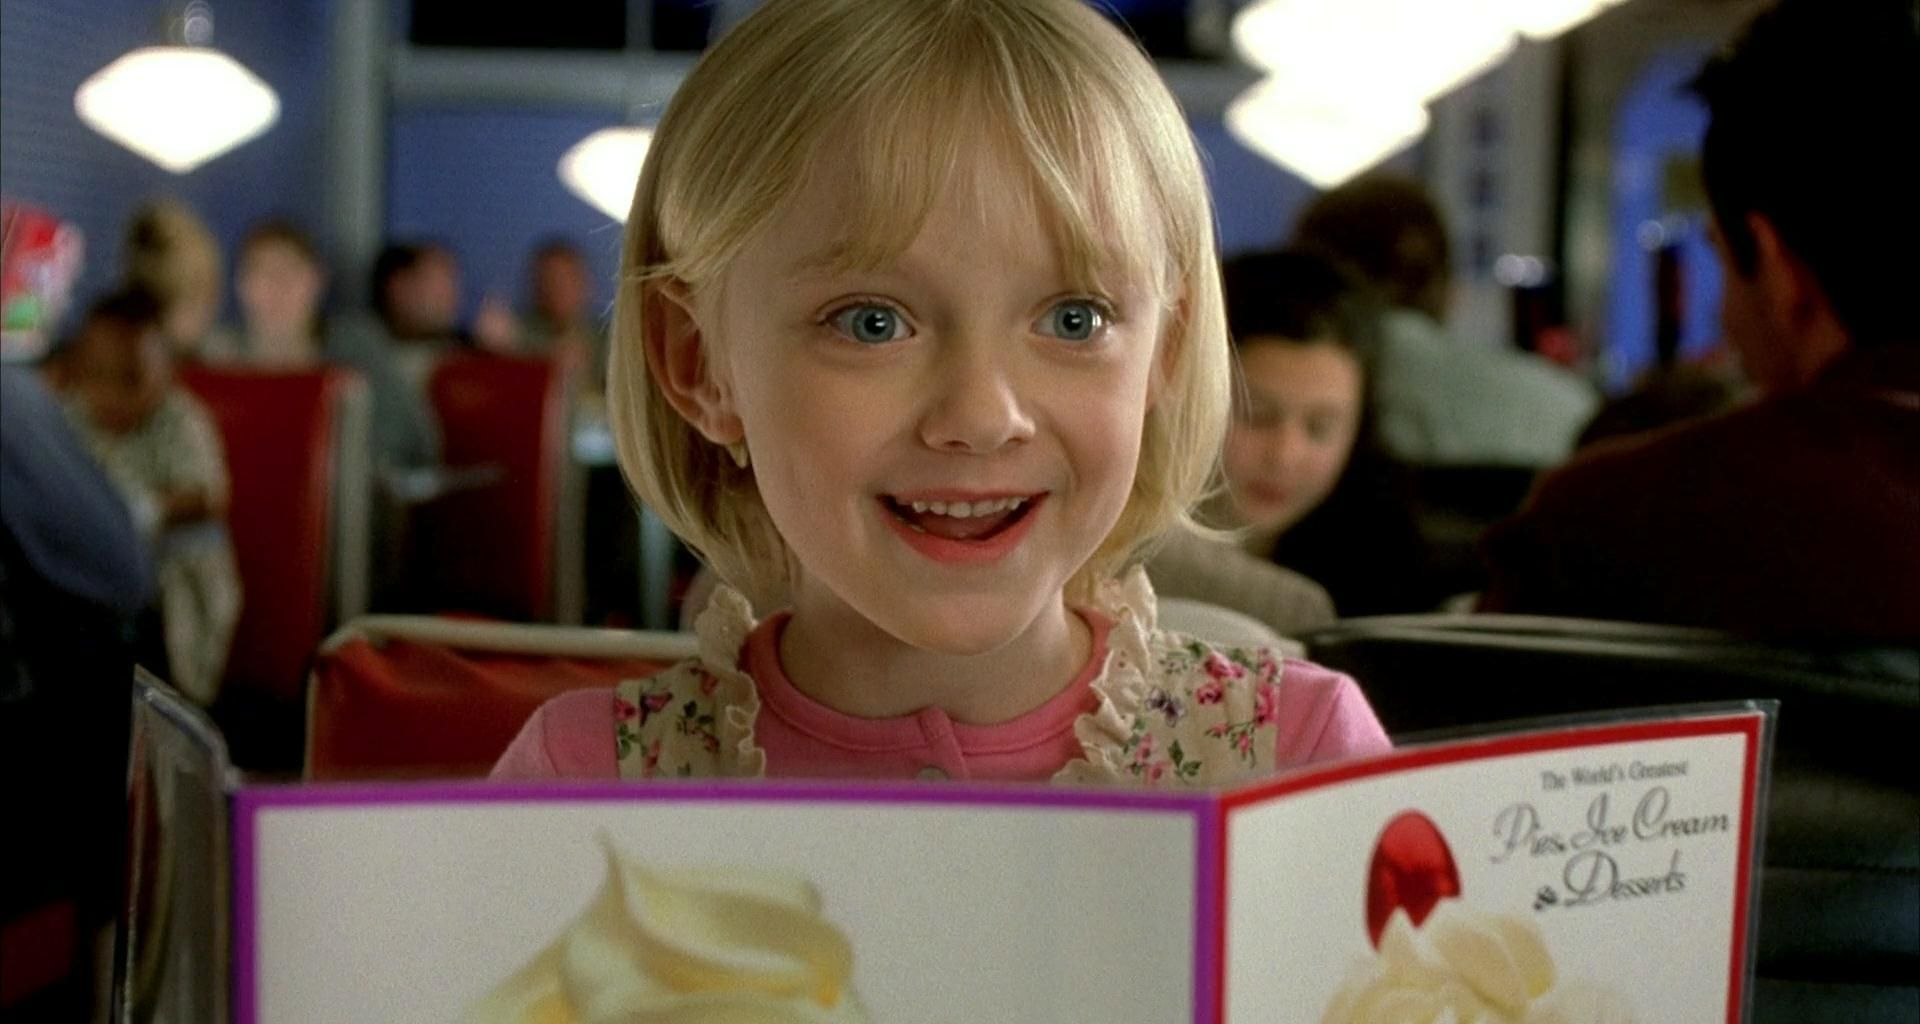 Young Dakota Fanning in I Am Sam | Best child actress ... I Am Sam Elle Fanning